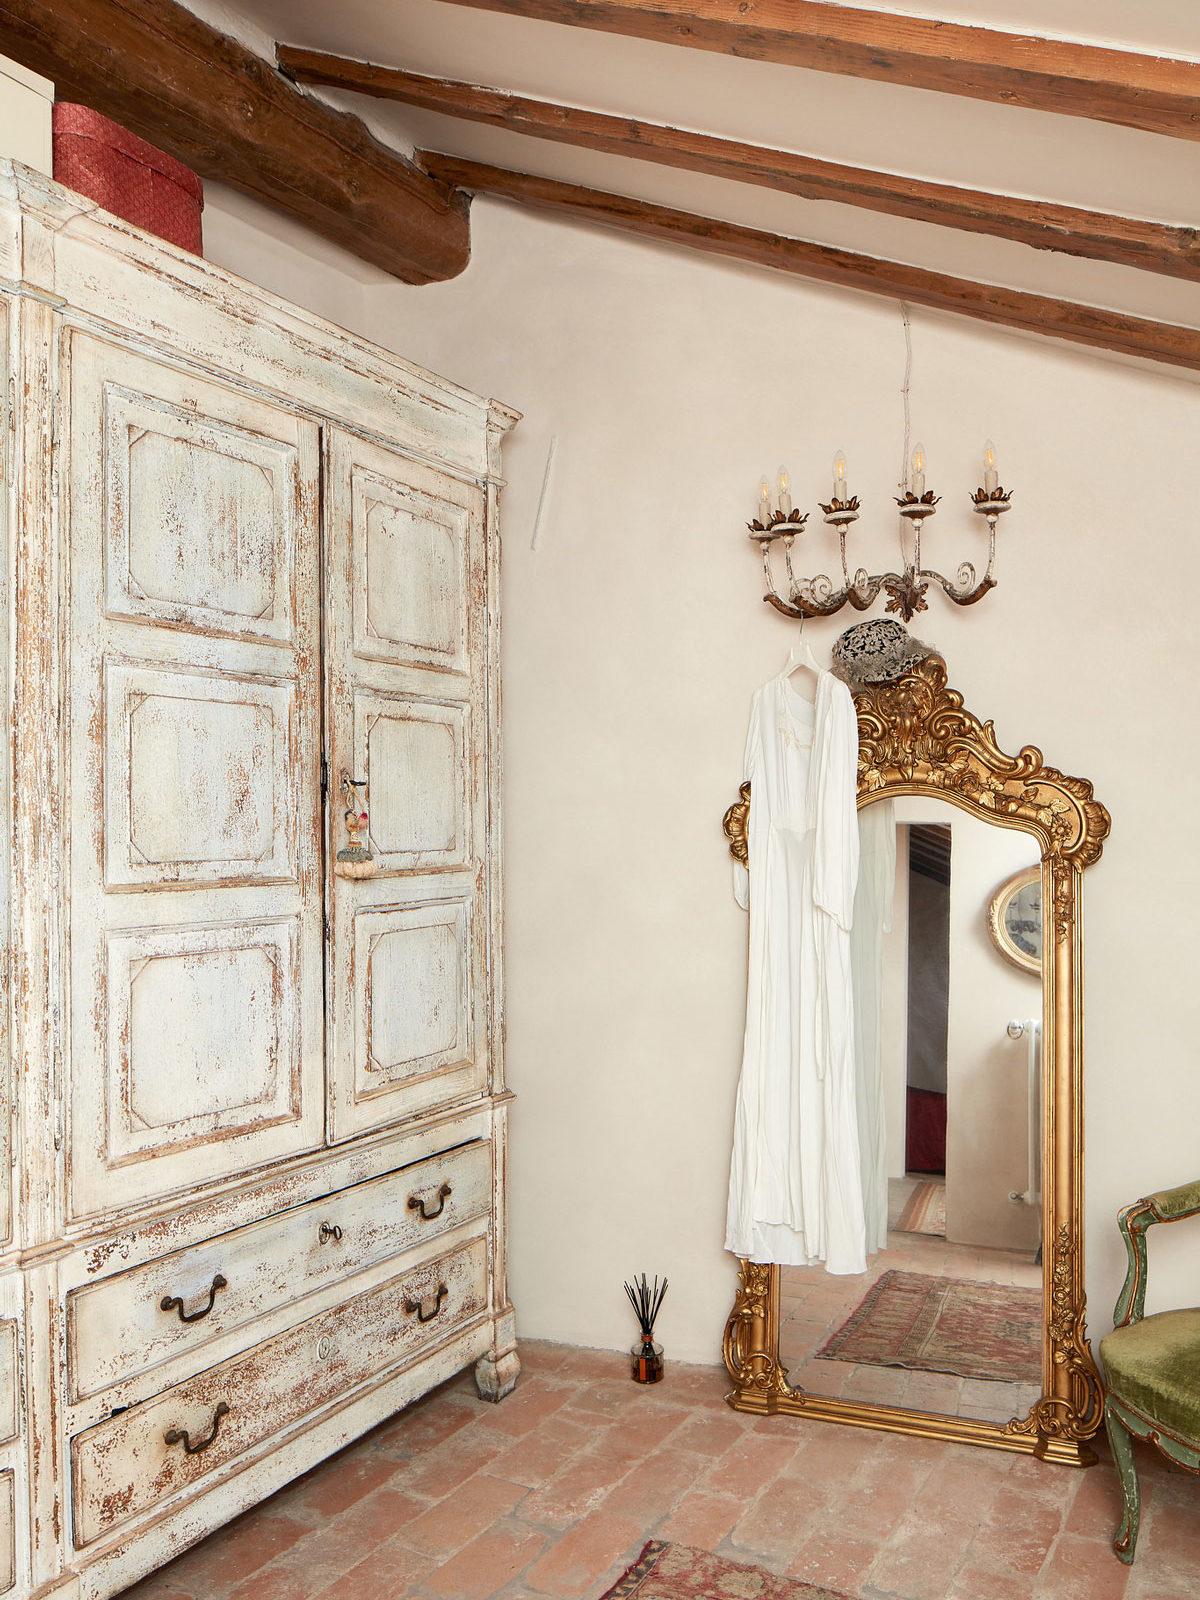 pareti tinteggiate a calce